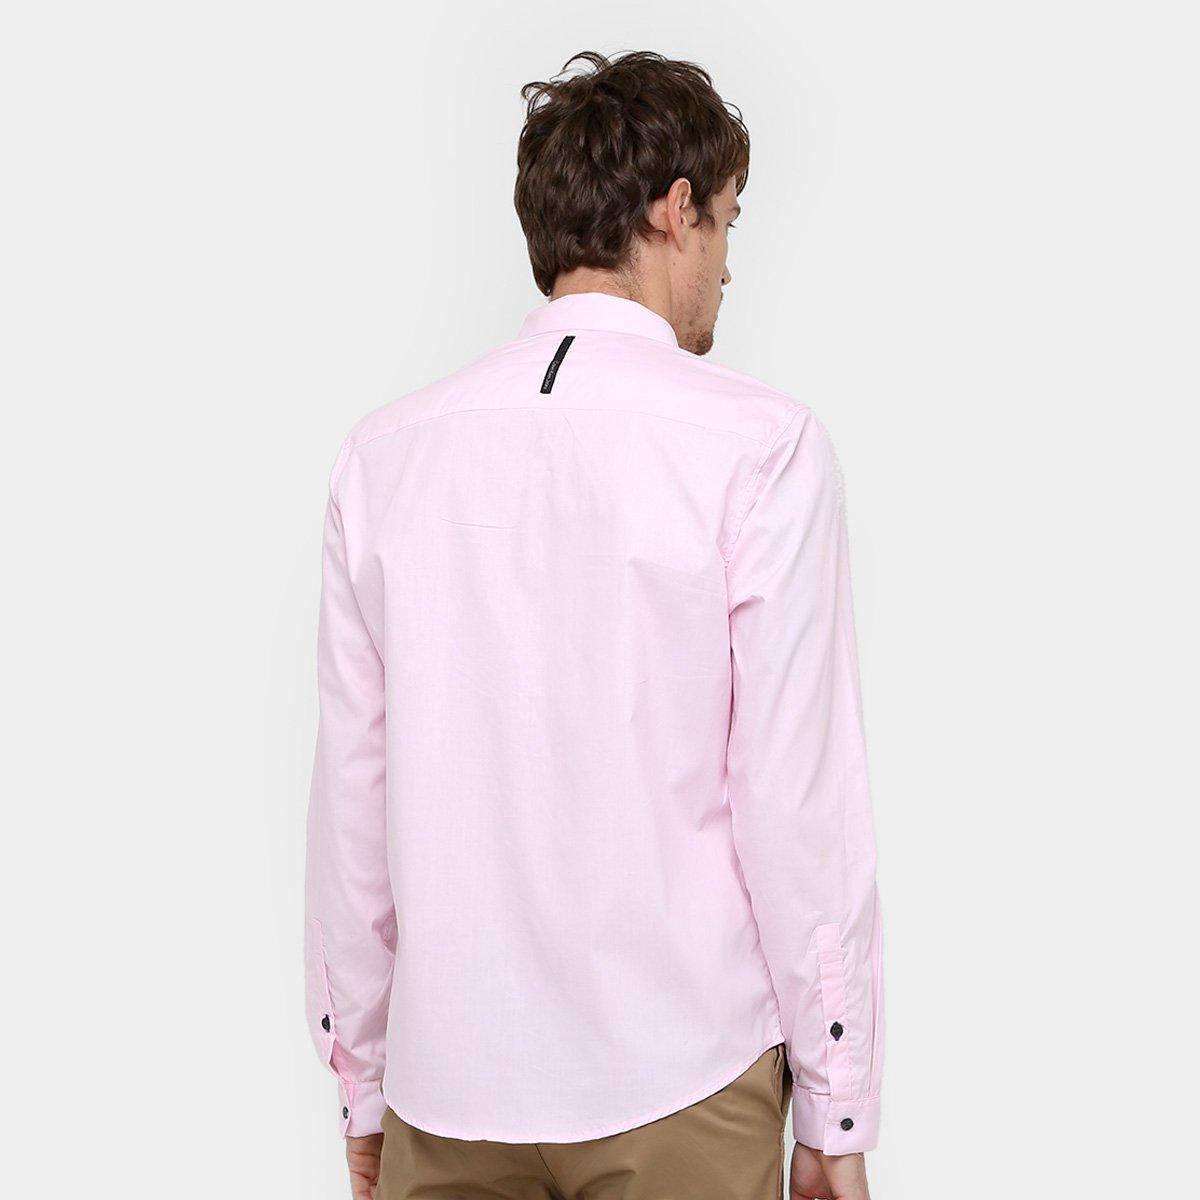 Camisa Social Calvin Klein Slim Fit Manga Longa Masculina - Compre ... 58c3ca060e